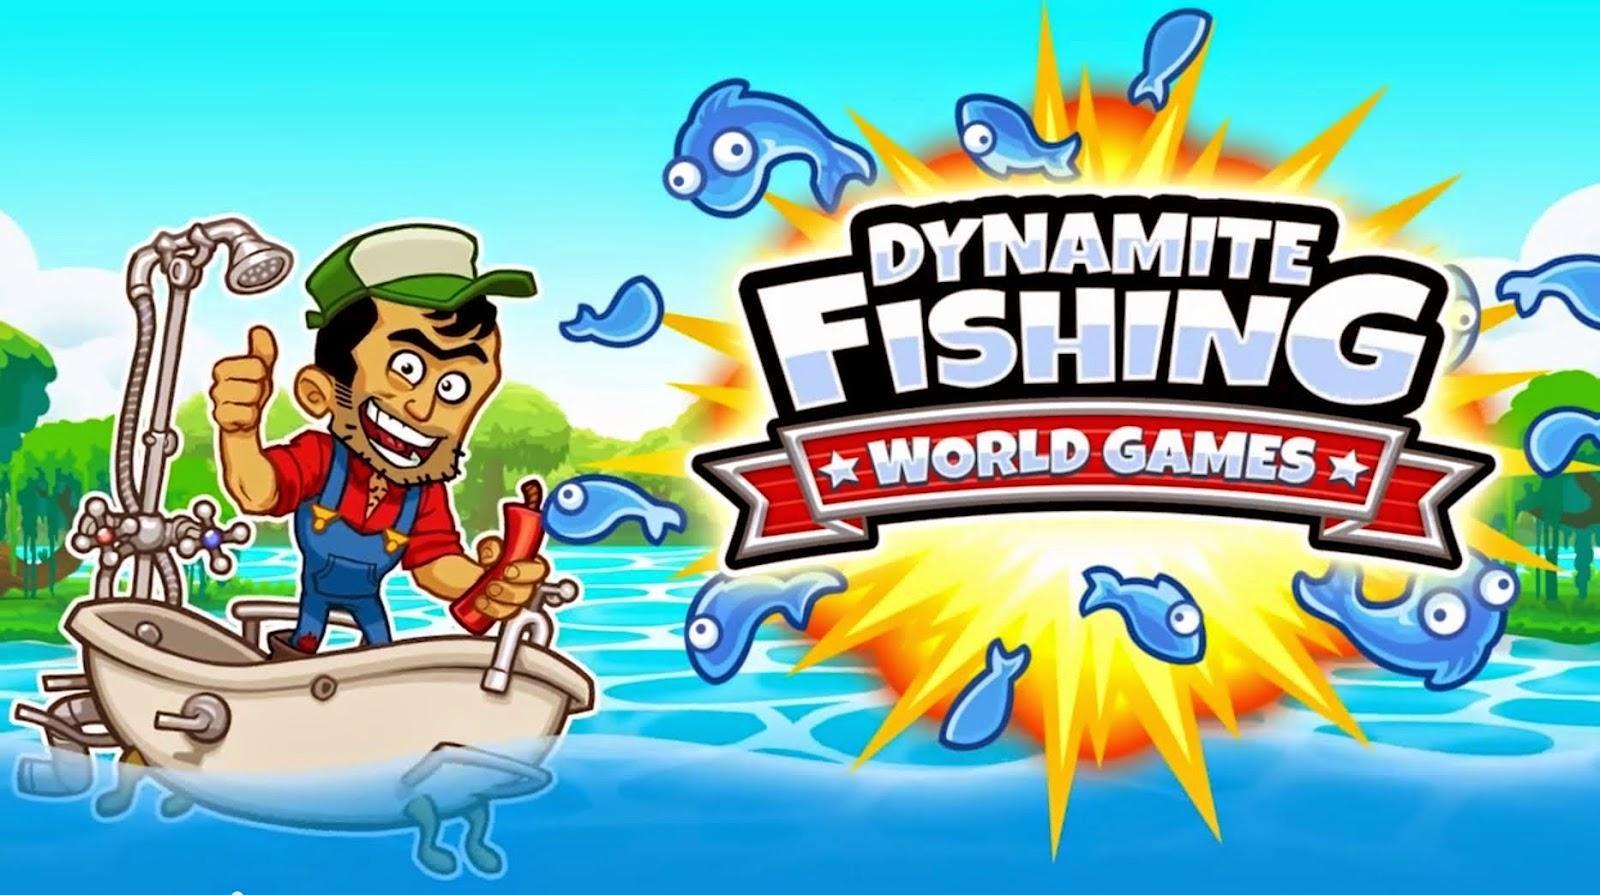 Dynamite fishing v1 1 3 mod apk data phone gadget media for Arcade fishing games